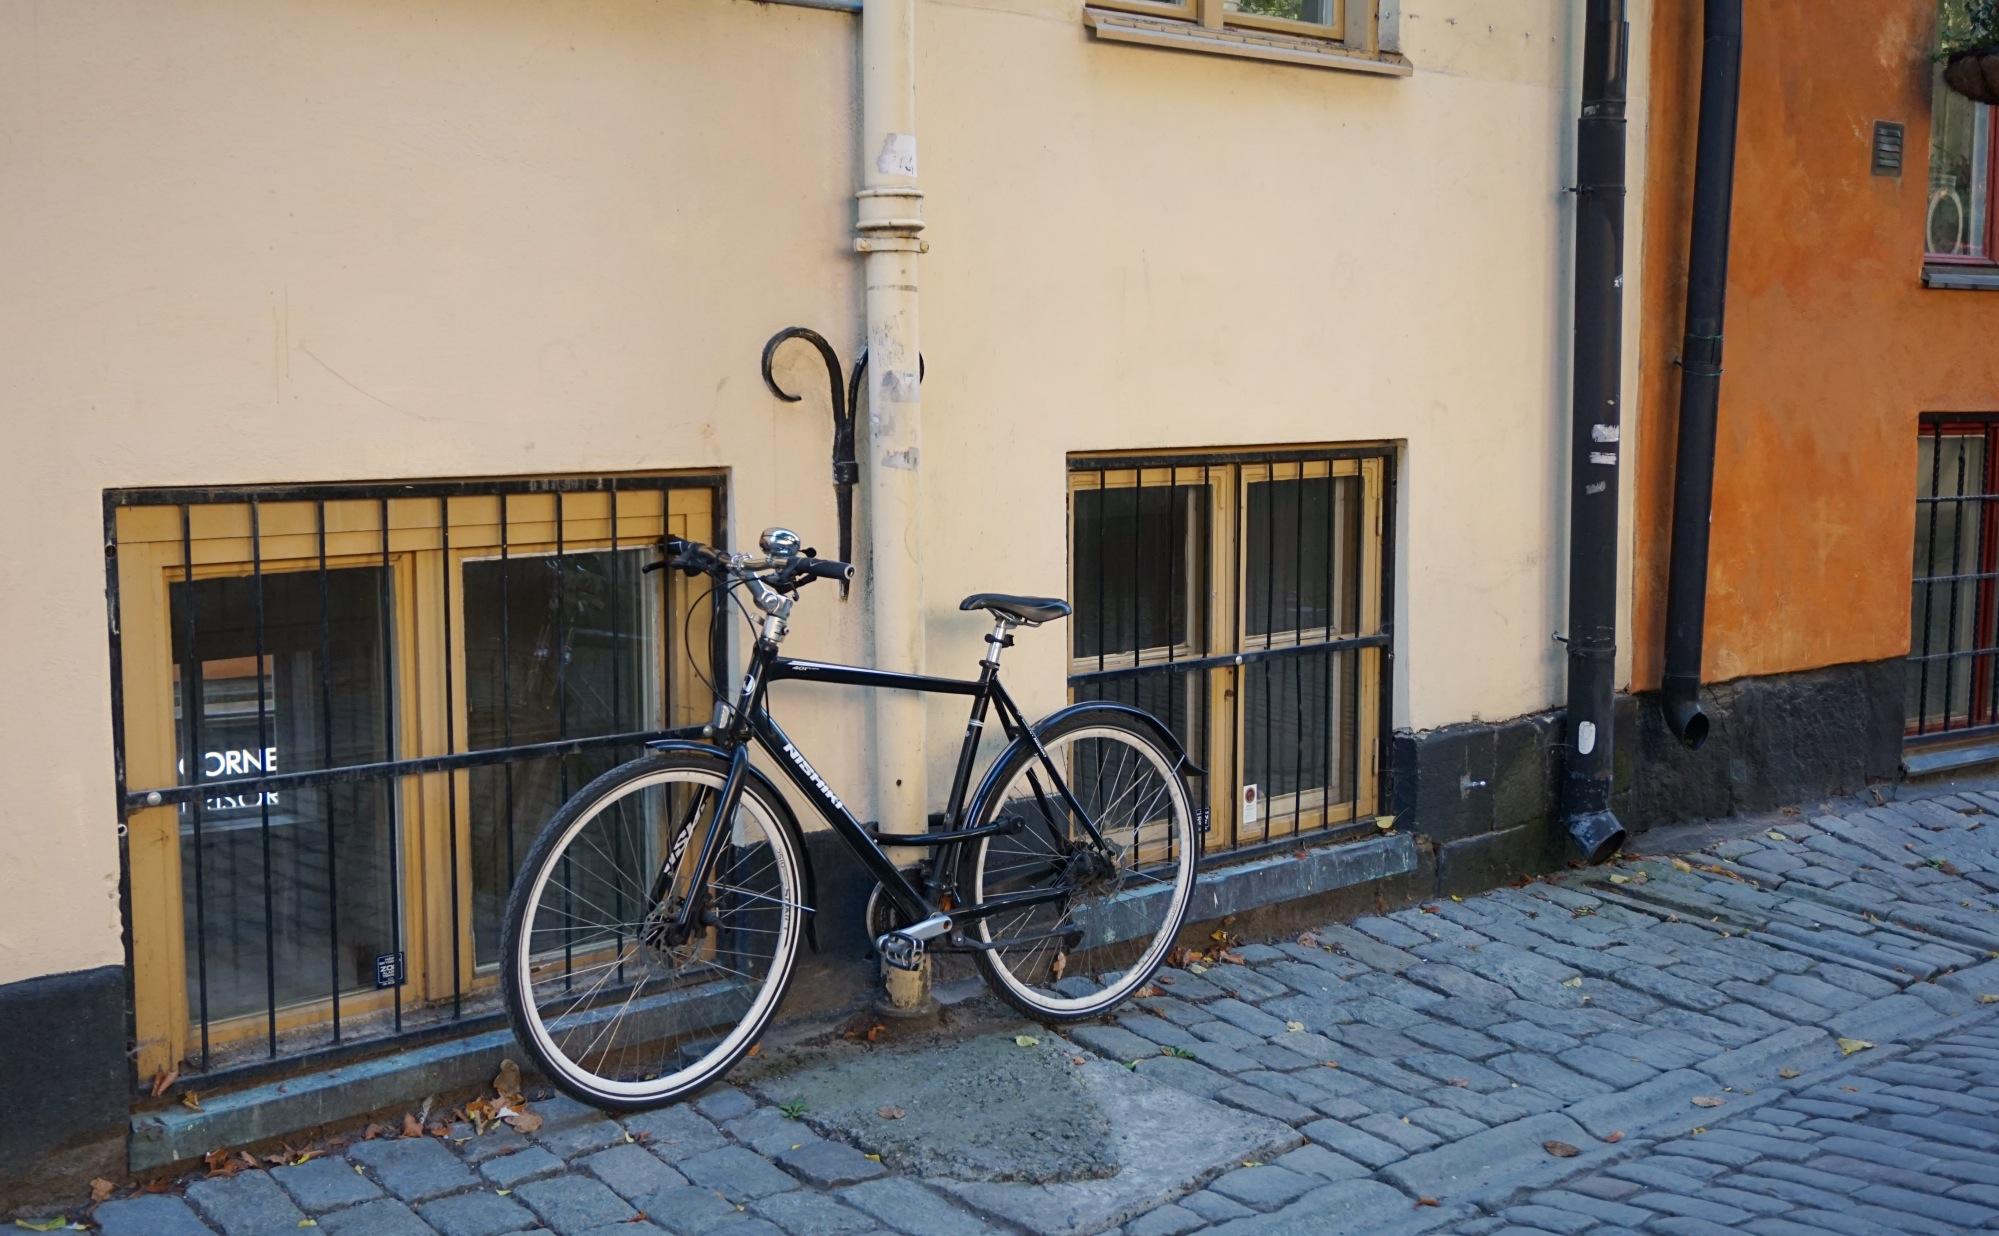 3-jours-a-stockholm-41